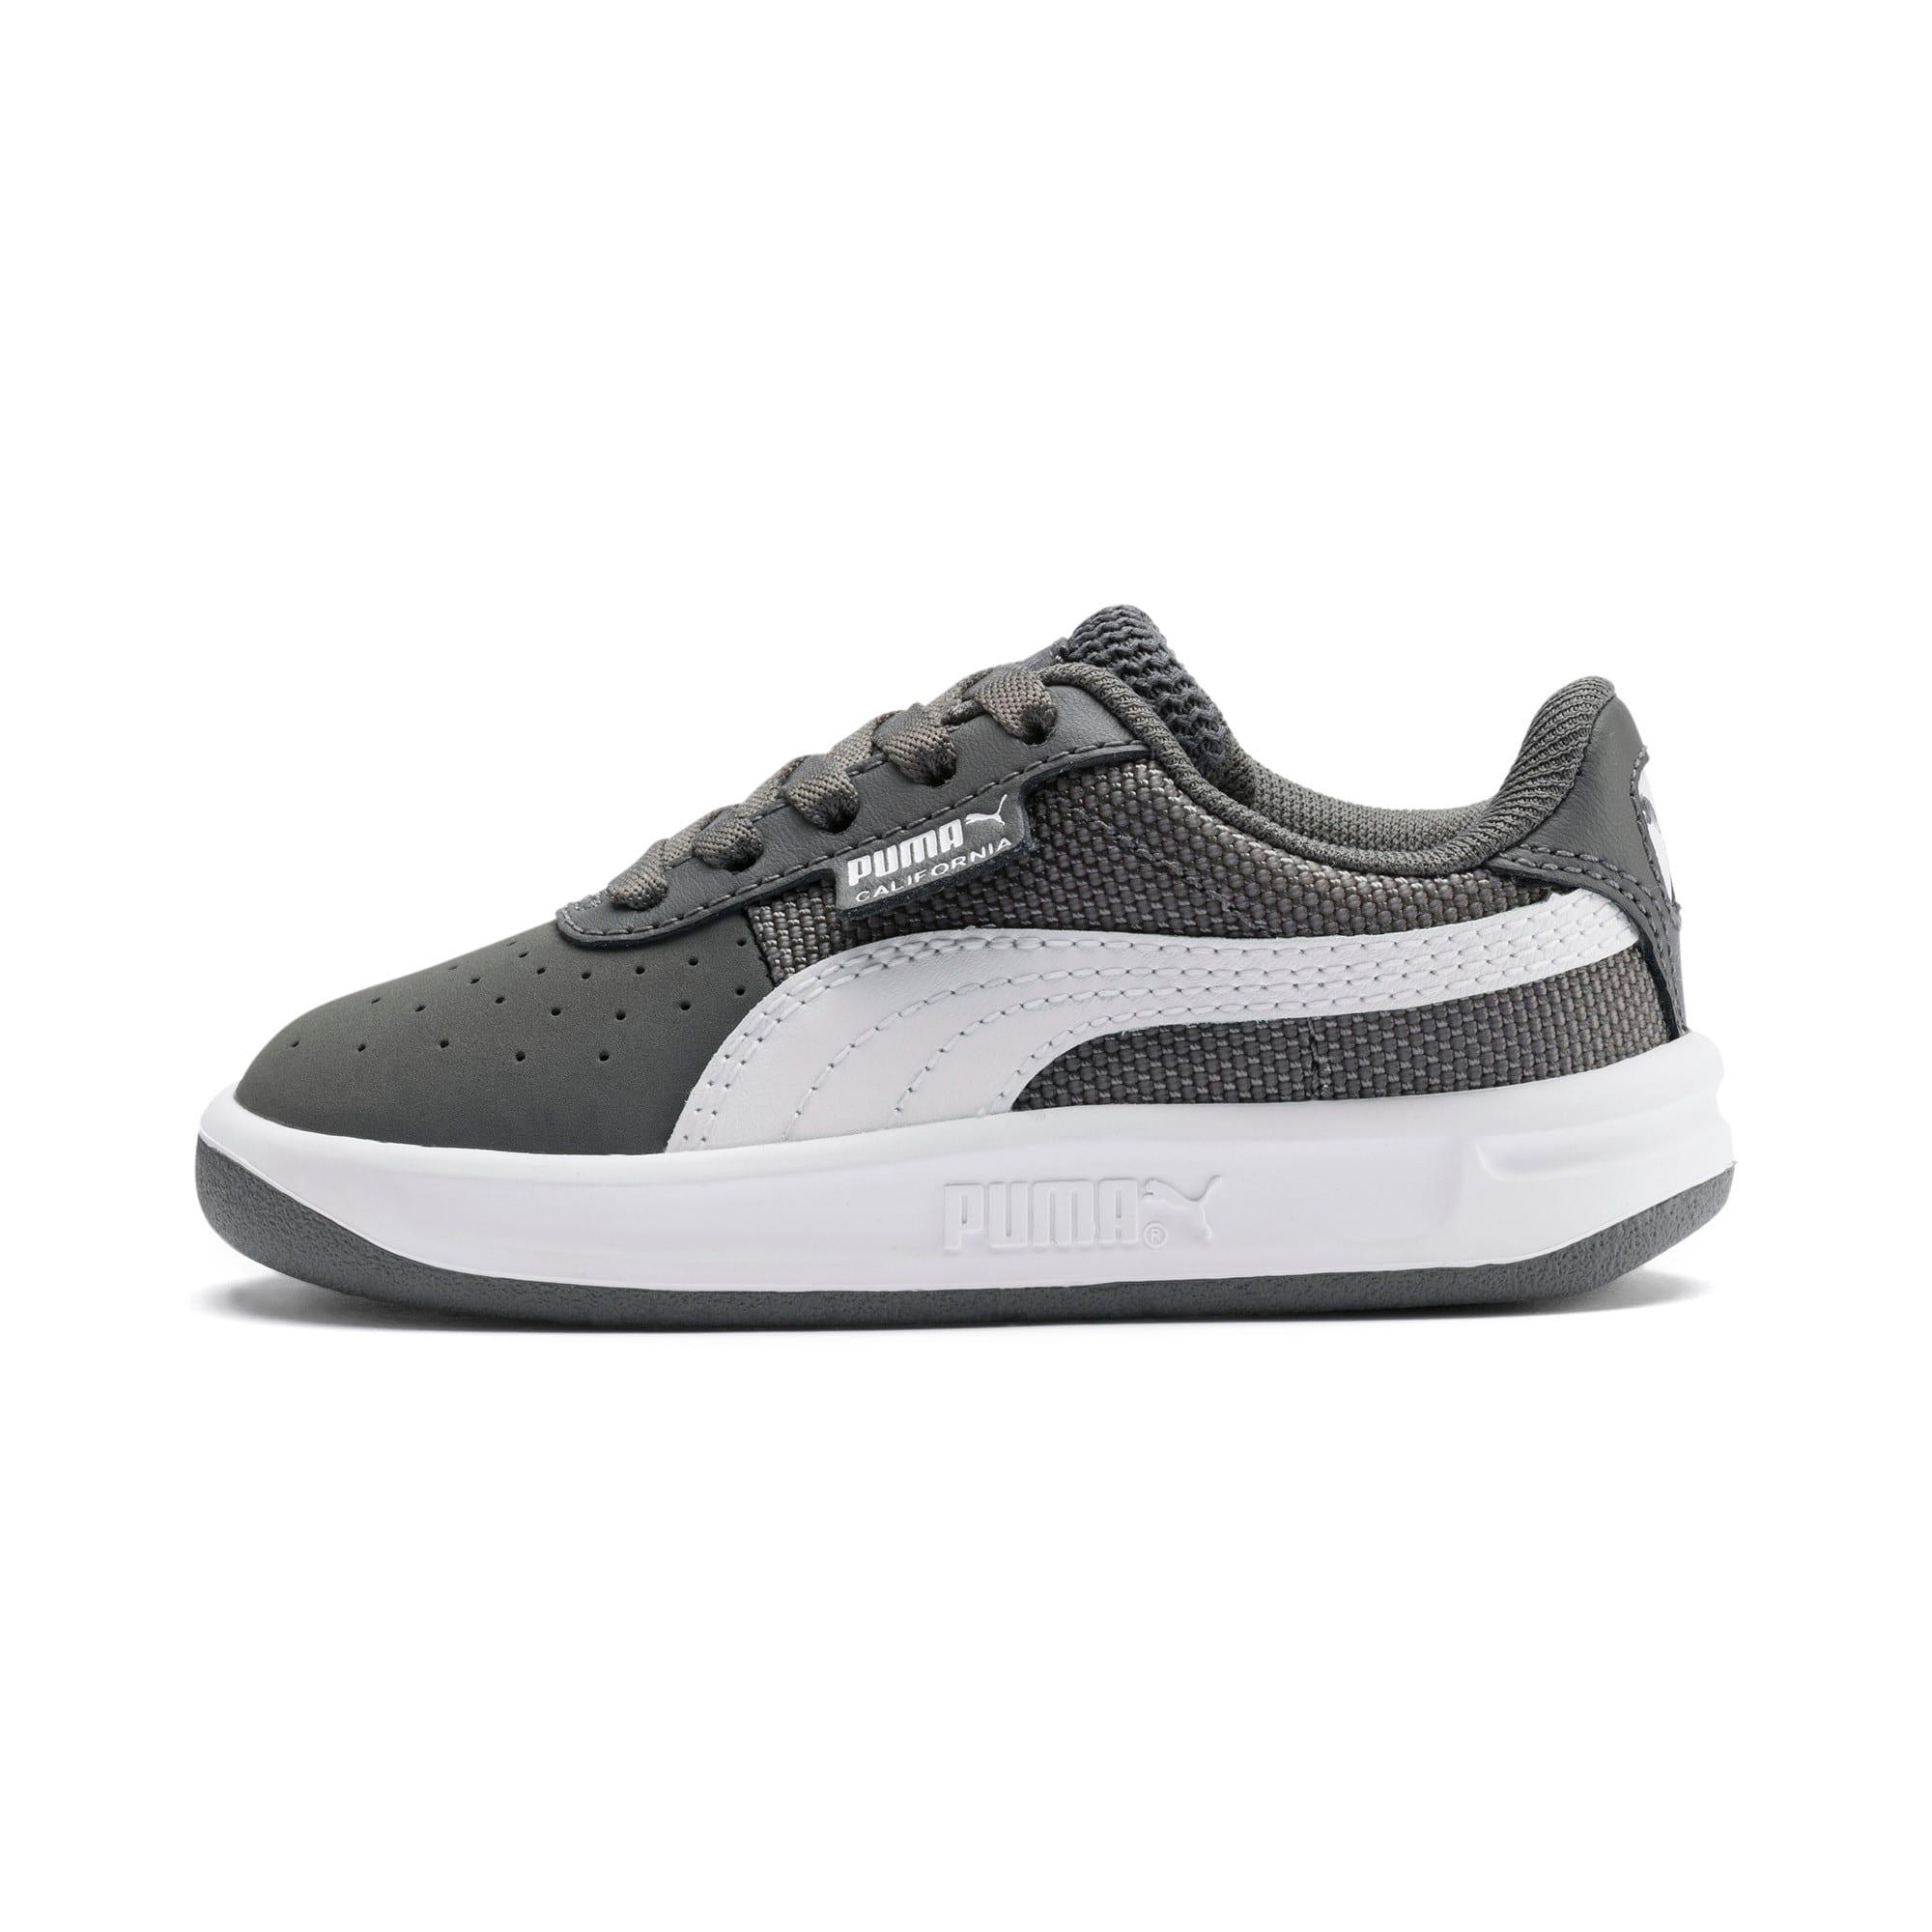 Thumbnail 1 of California Toddler Shoes, CASTLEROCK-Puma White, medium